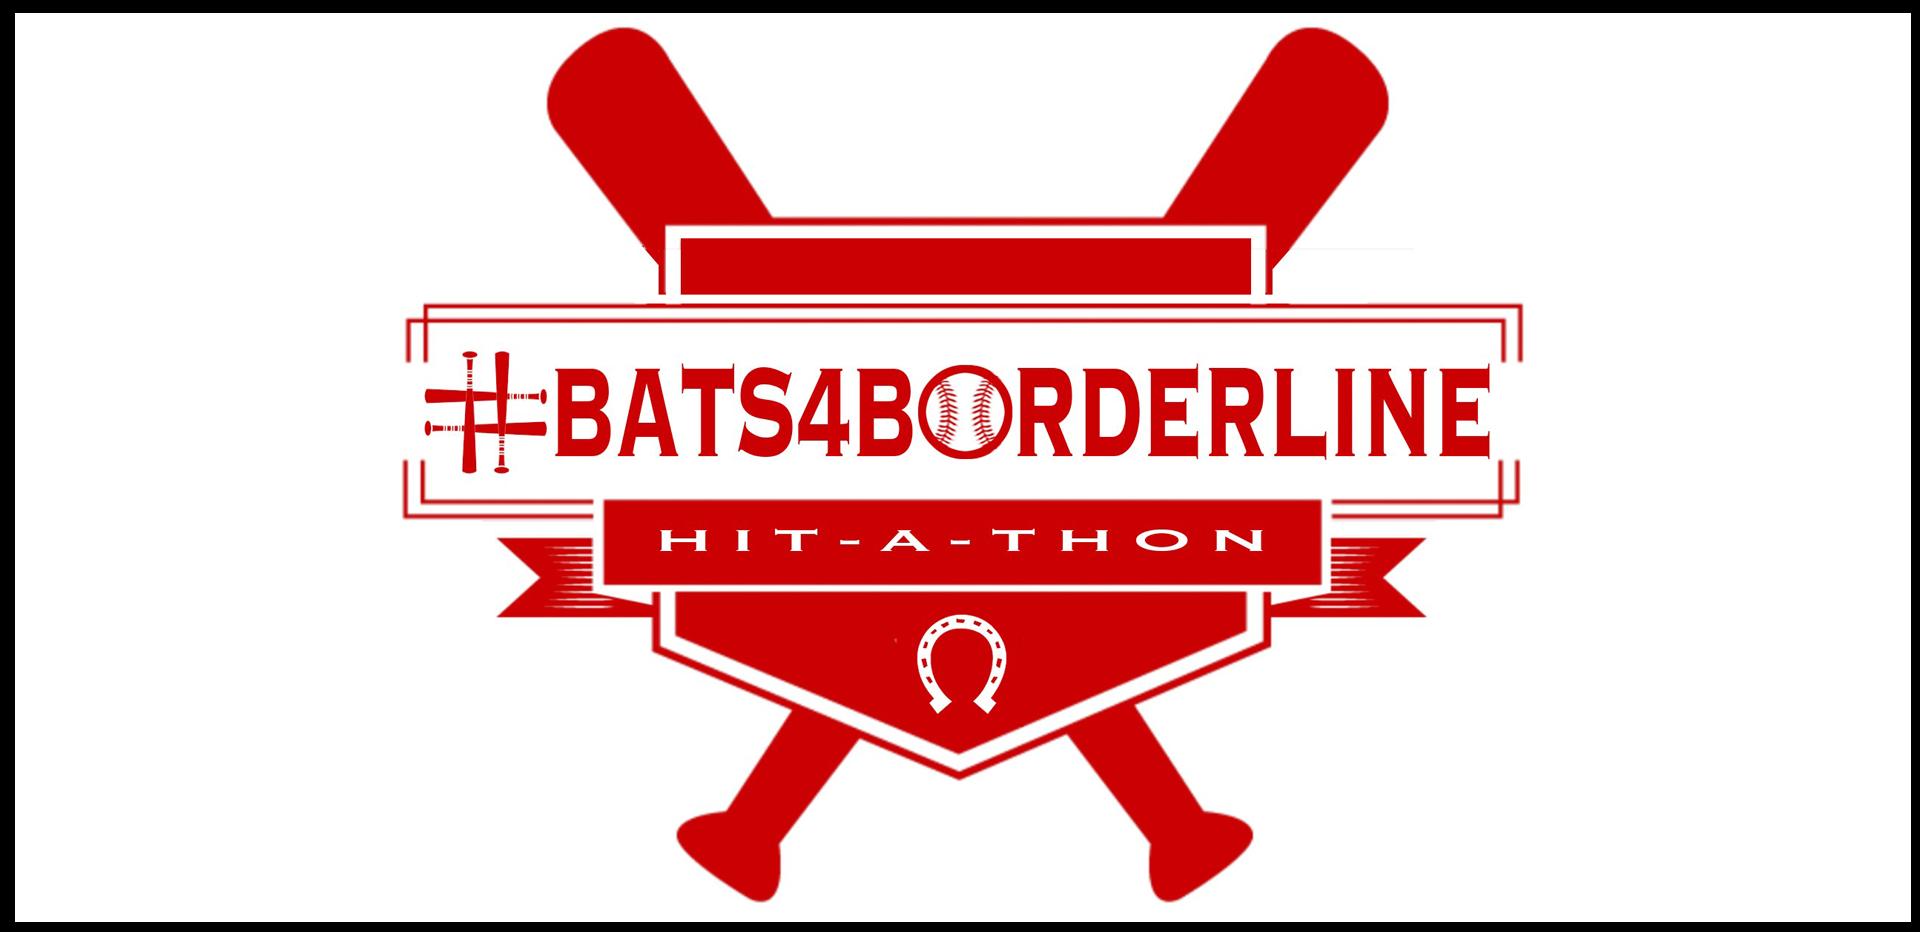 #Bats4Borderline